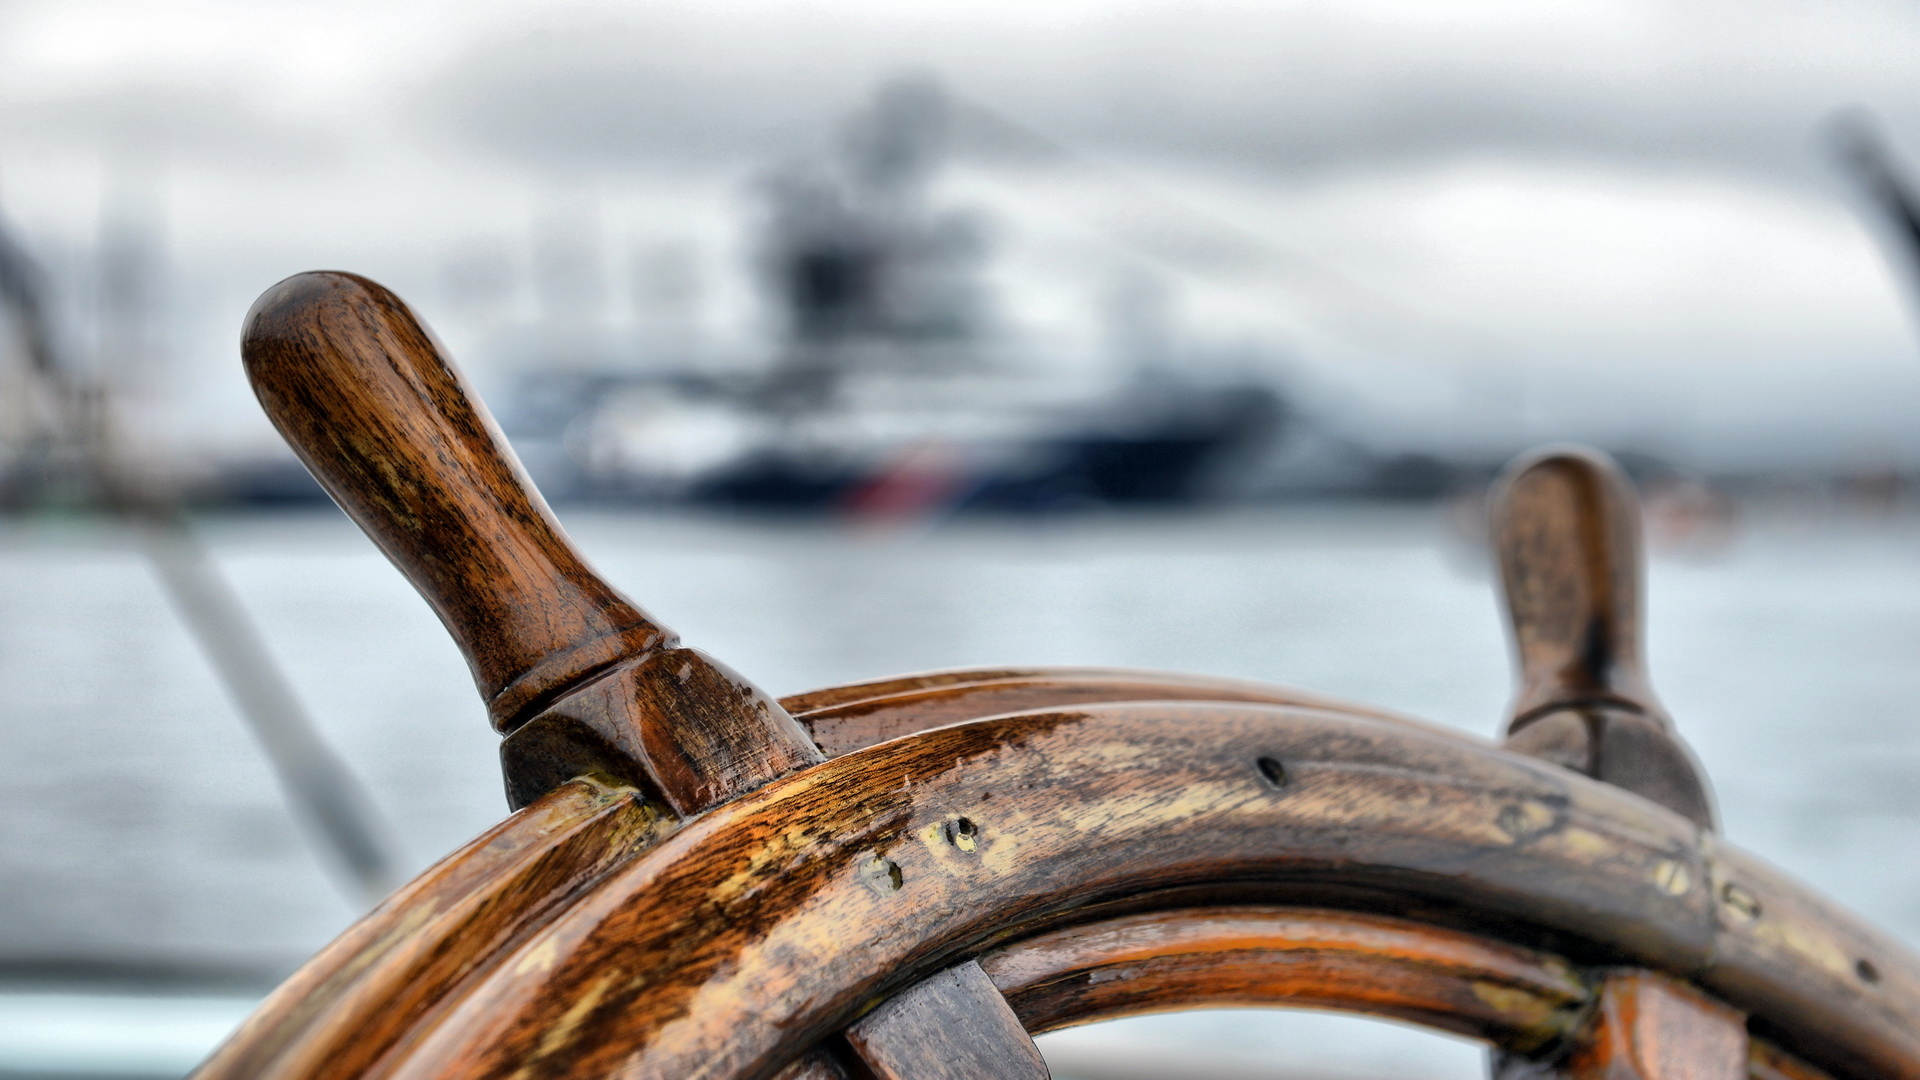 Įdomi pažintis: jachtos šefas